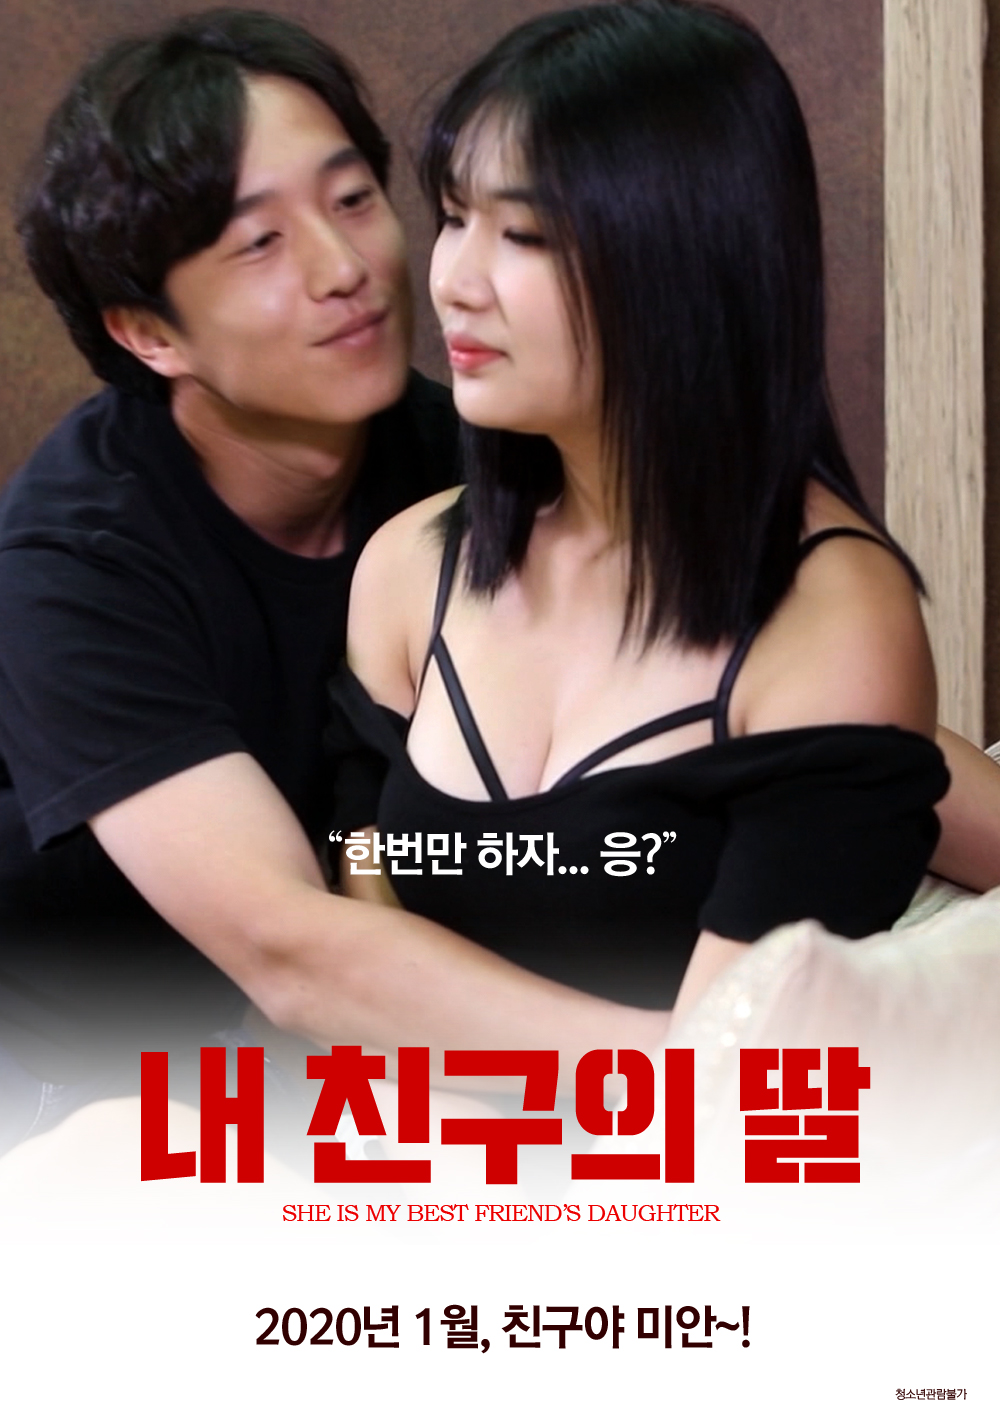 My Friend's Daughter Full Korea 18+ Adult Movie Online Free